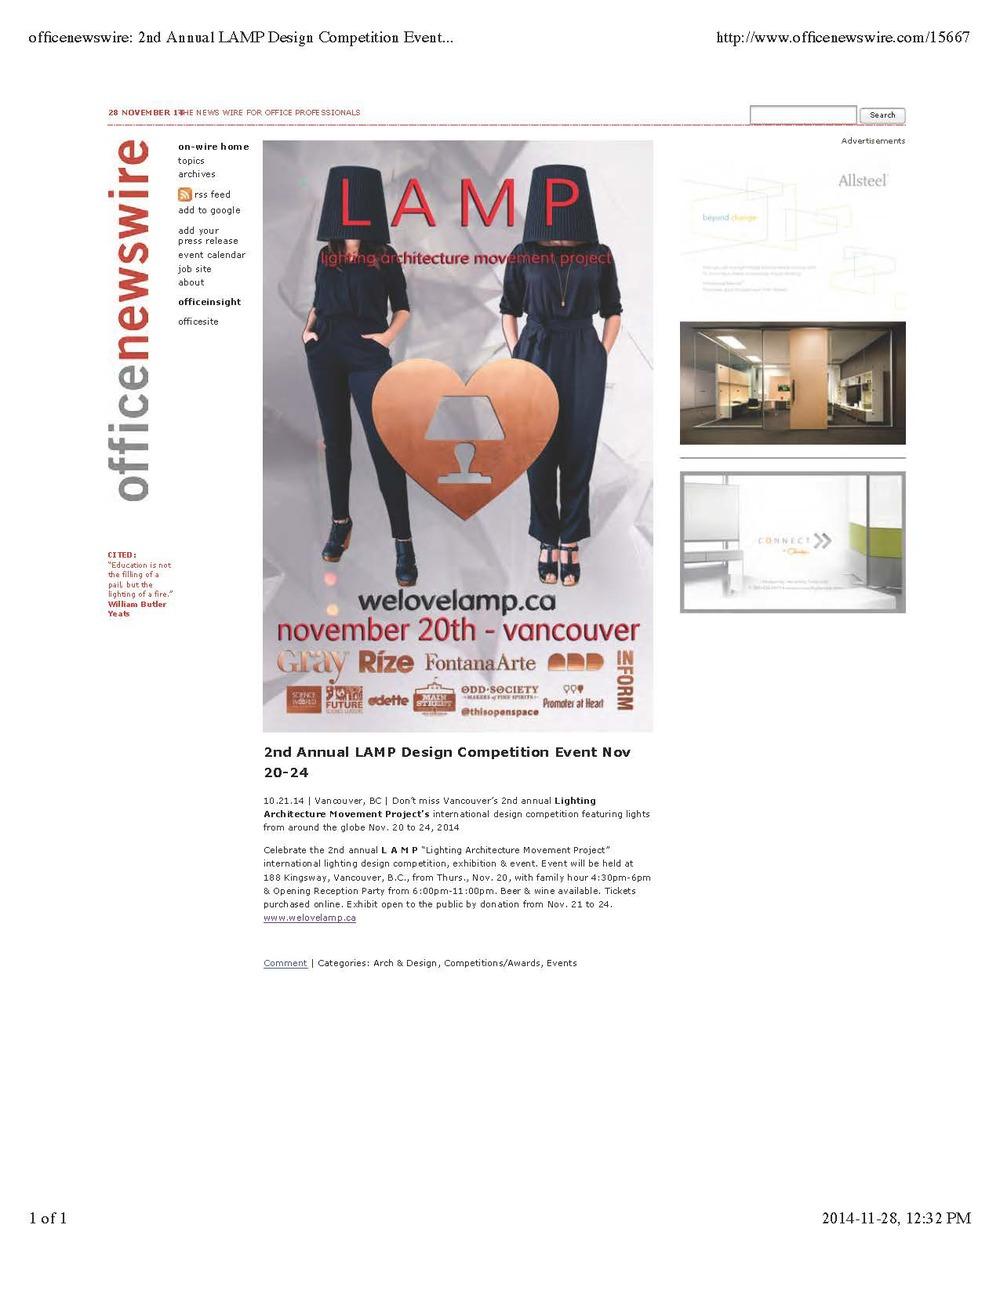 LAMP 2014 Press Kit_Page_17.jpg